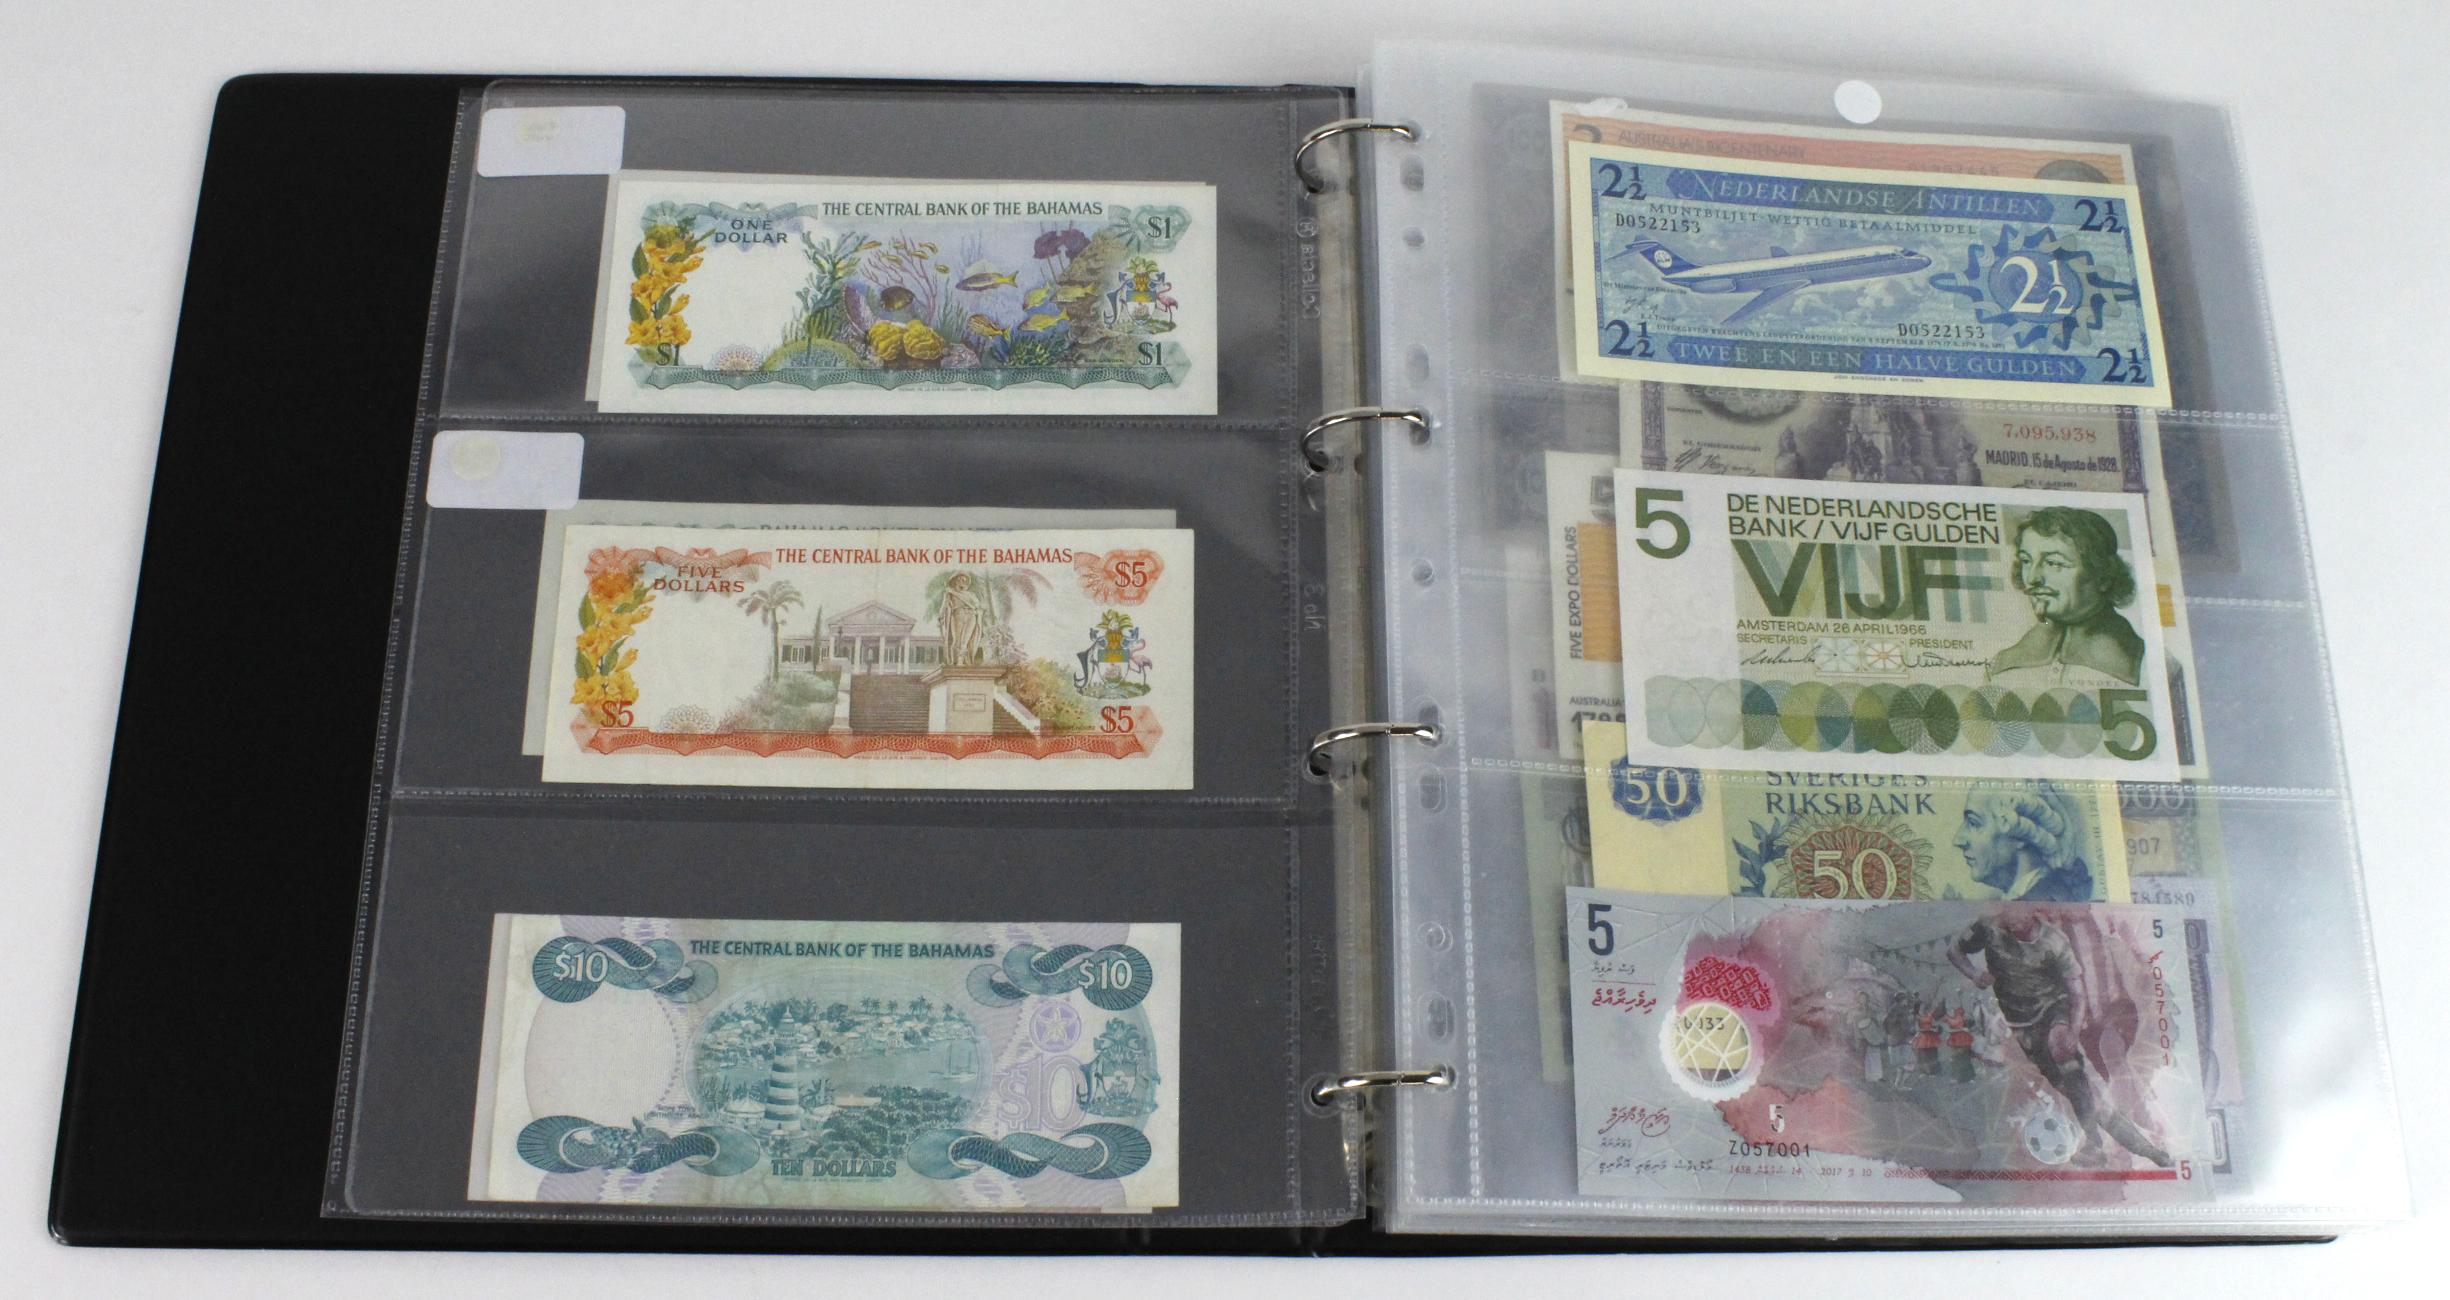 World (163), in banknote album including Bahamas, Spain, Sweden, Netherlands, Algeria, Macau, - Image 3 of 57